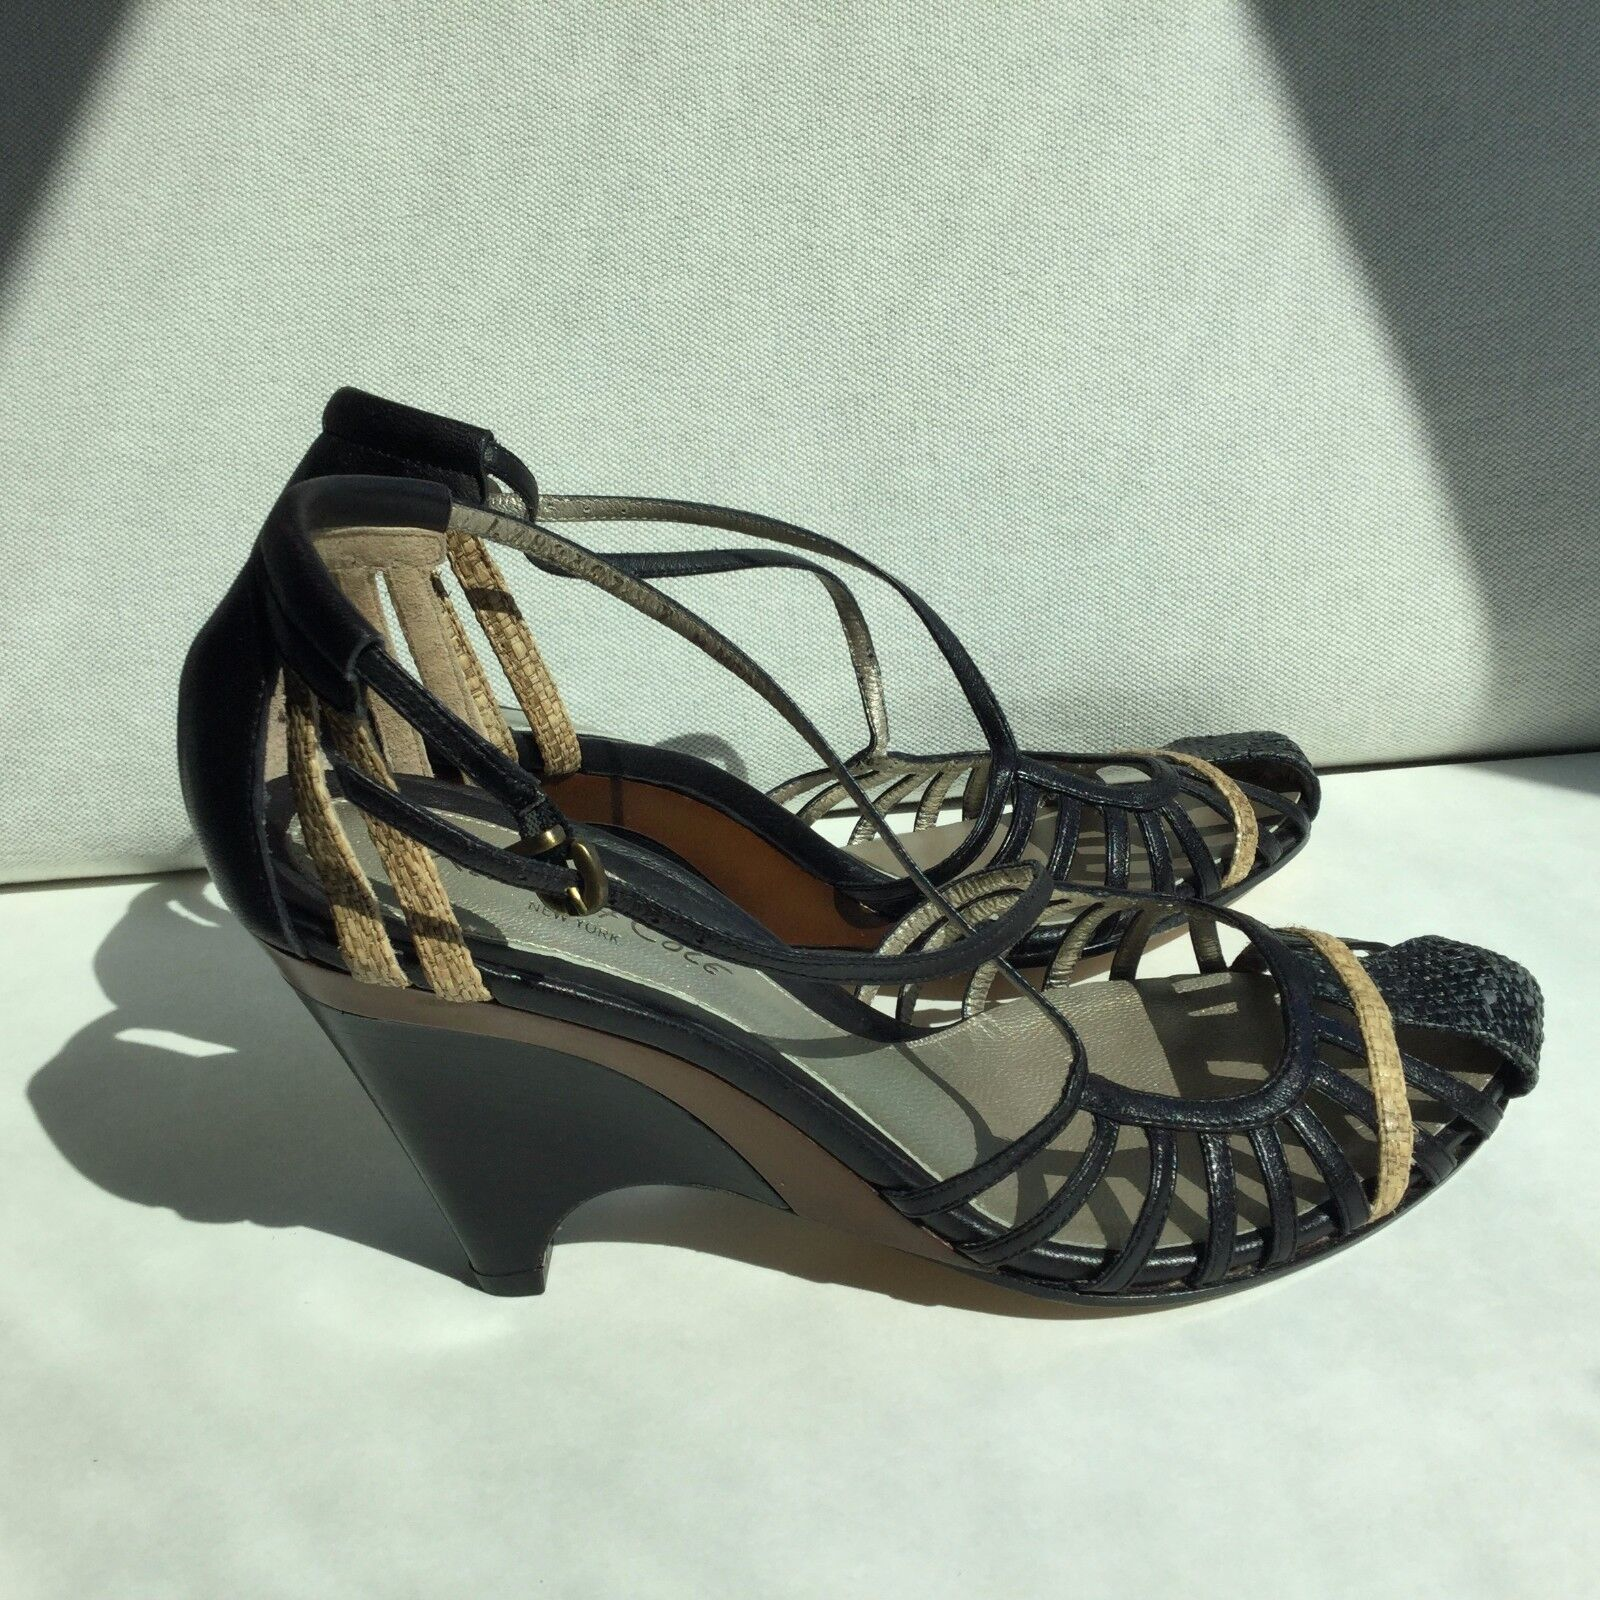 grandi prezzi scontati Kenneth Cole Wood High Heel Heel Heel Leather Wedges Sandals Dimensione 7 scarpe Retail P  150  Garanzia di vestibilità al 100%